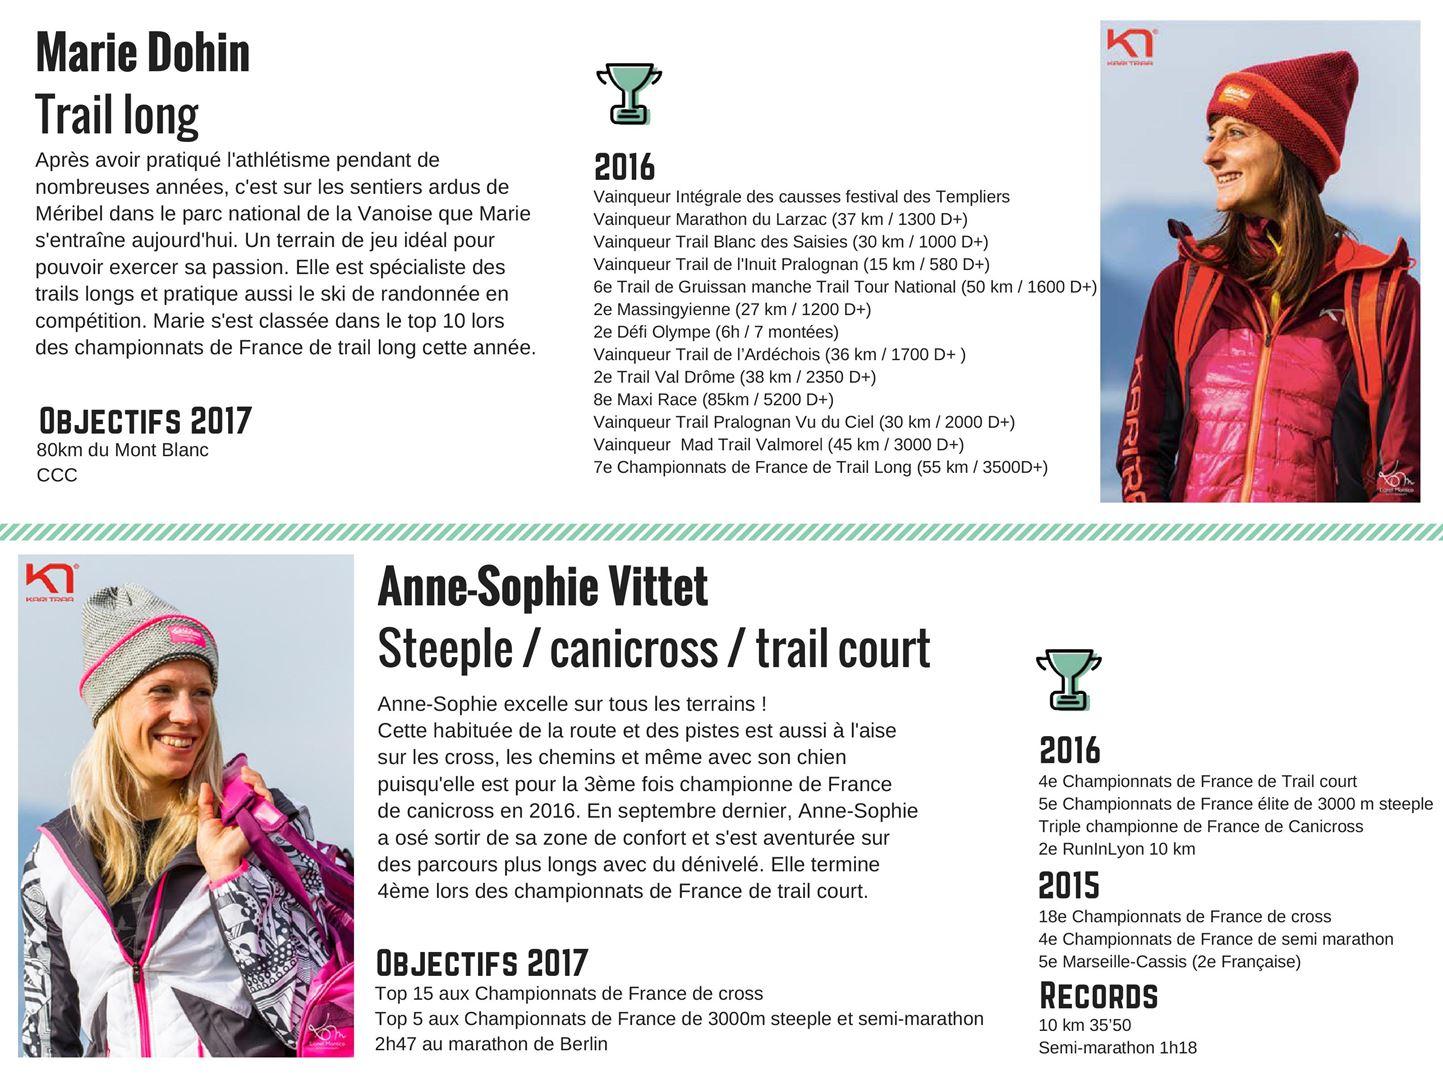 copie 0 0005 - TEAM KARI TRAA : UN TEAM 100% FEMININ !